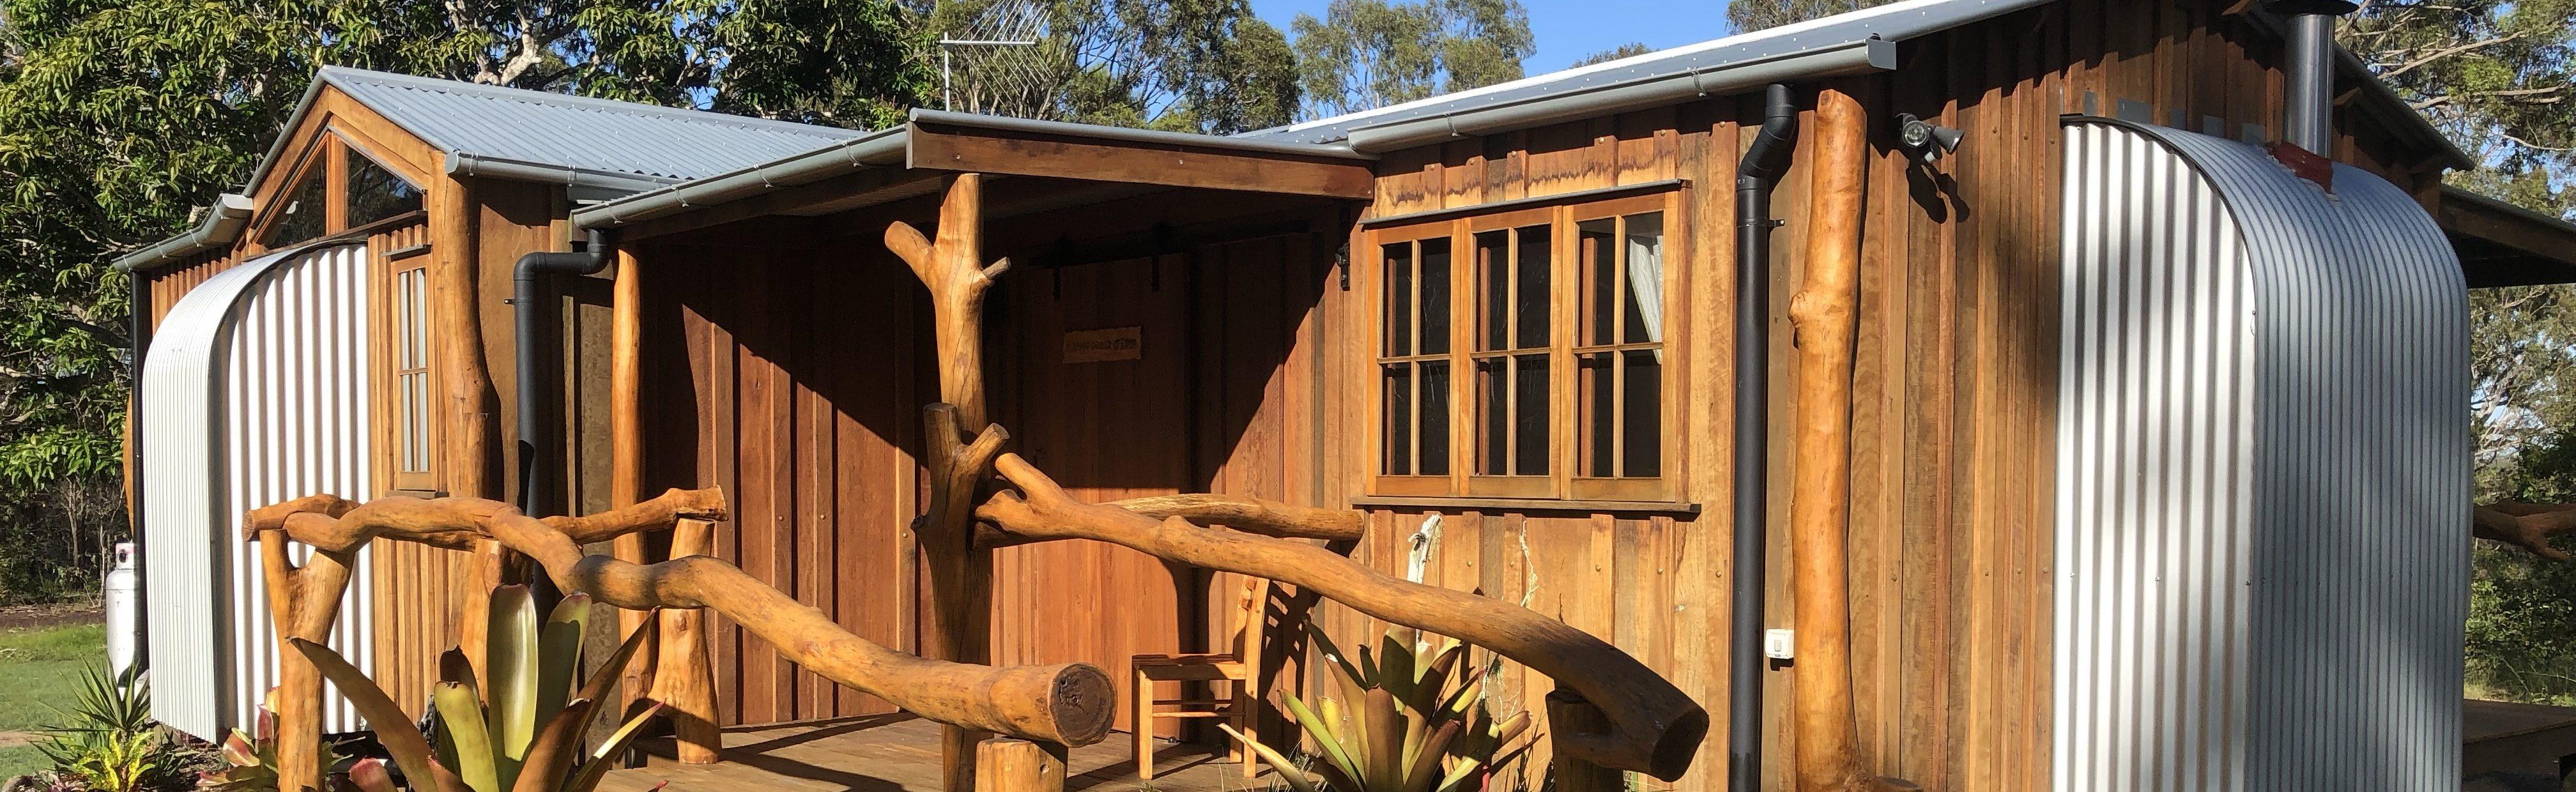 Mango Lodge at River Heads, Hervey Bay, Queensland